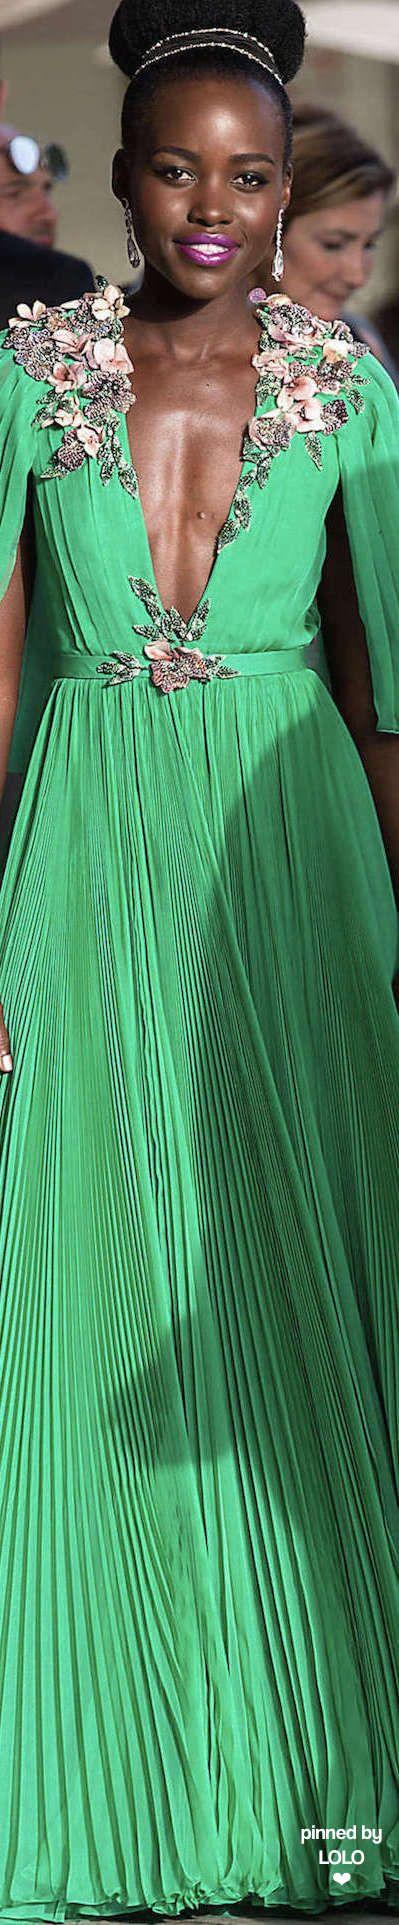 Lupita Nyong'o in Gucci 2015 Cannes Film Festival | LOLO❤︎